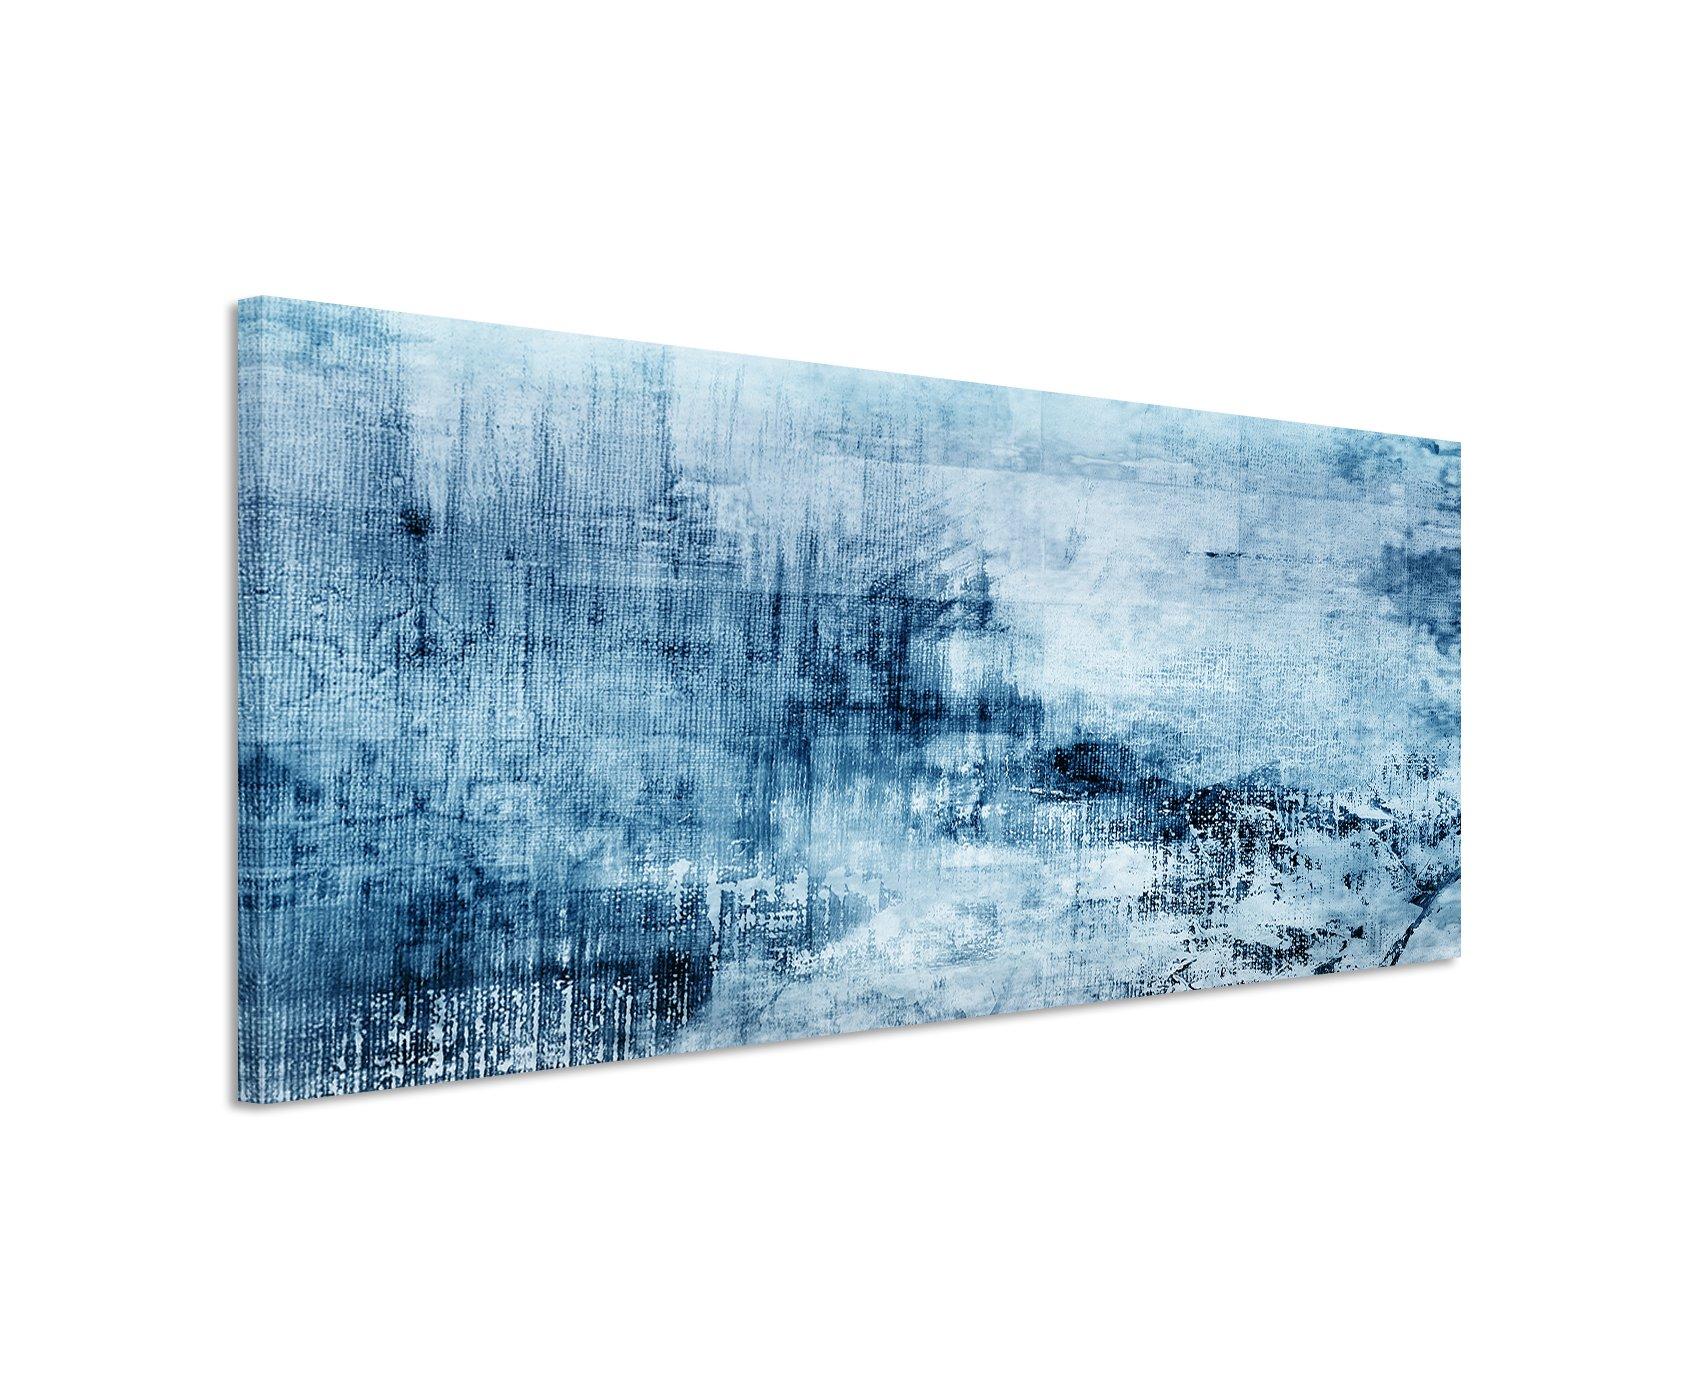 Bilder abstrakt acryl - Wandbild petrol ...